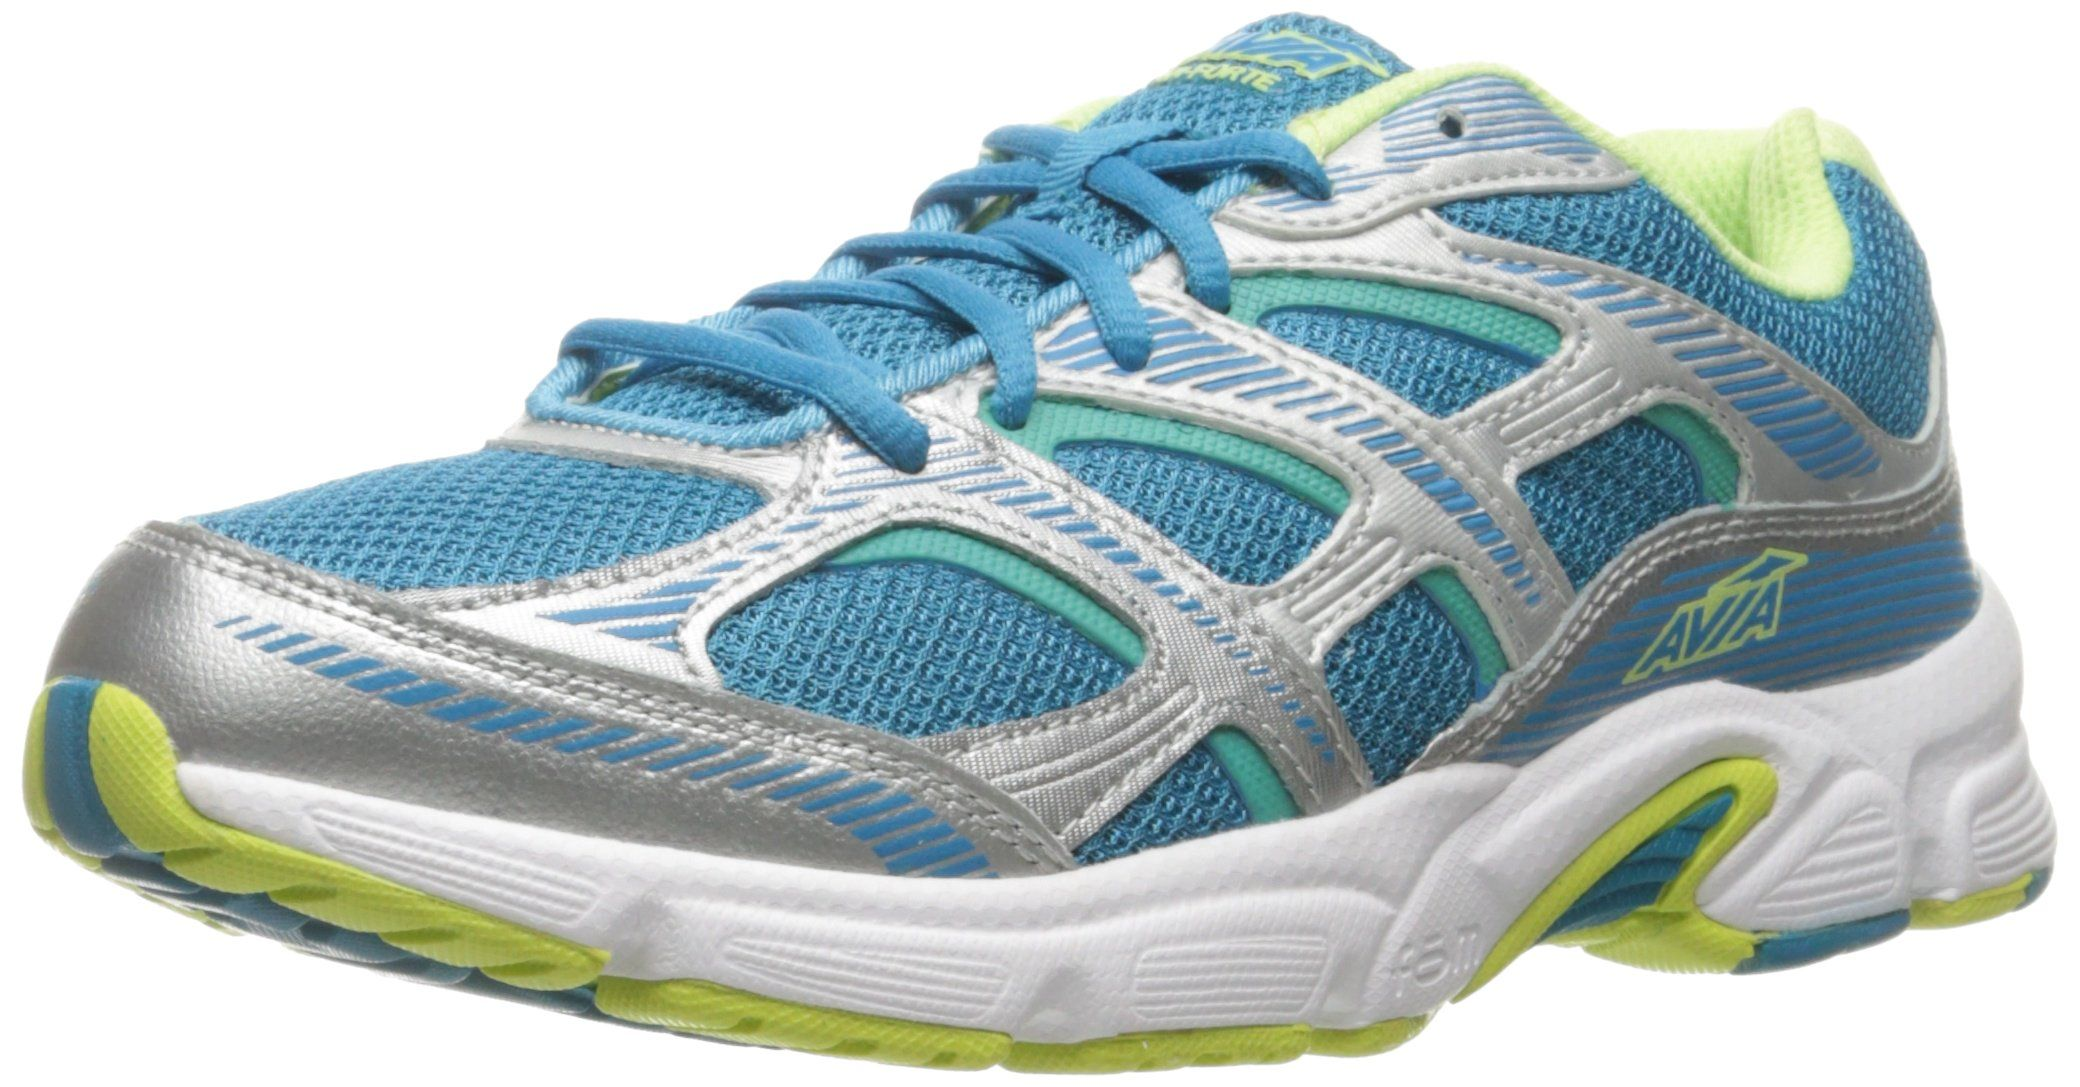 AVIA Women's AviForte Running Shoe, Malibu Teal/Chrome